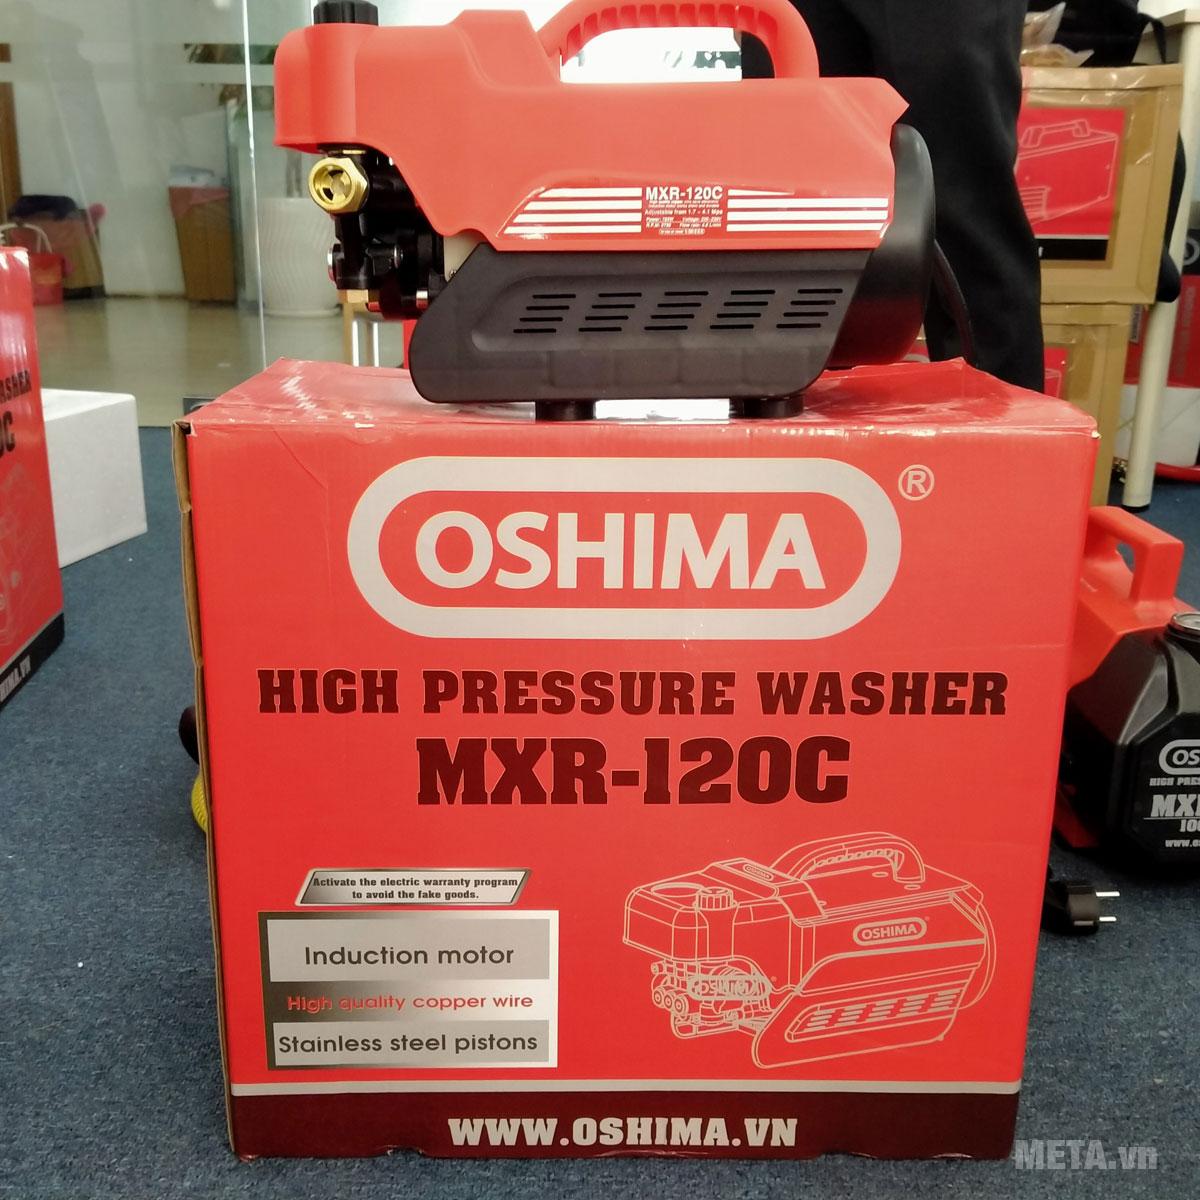 Oshima OS-120C